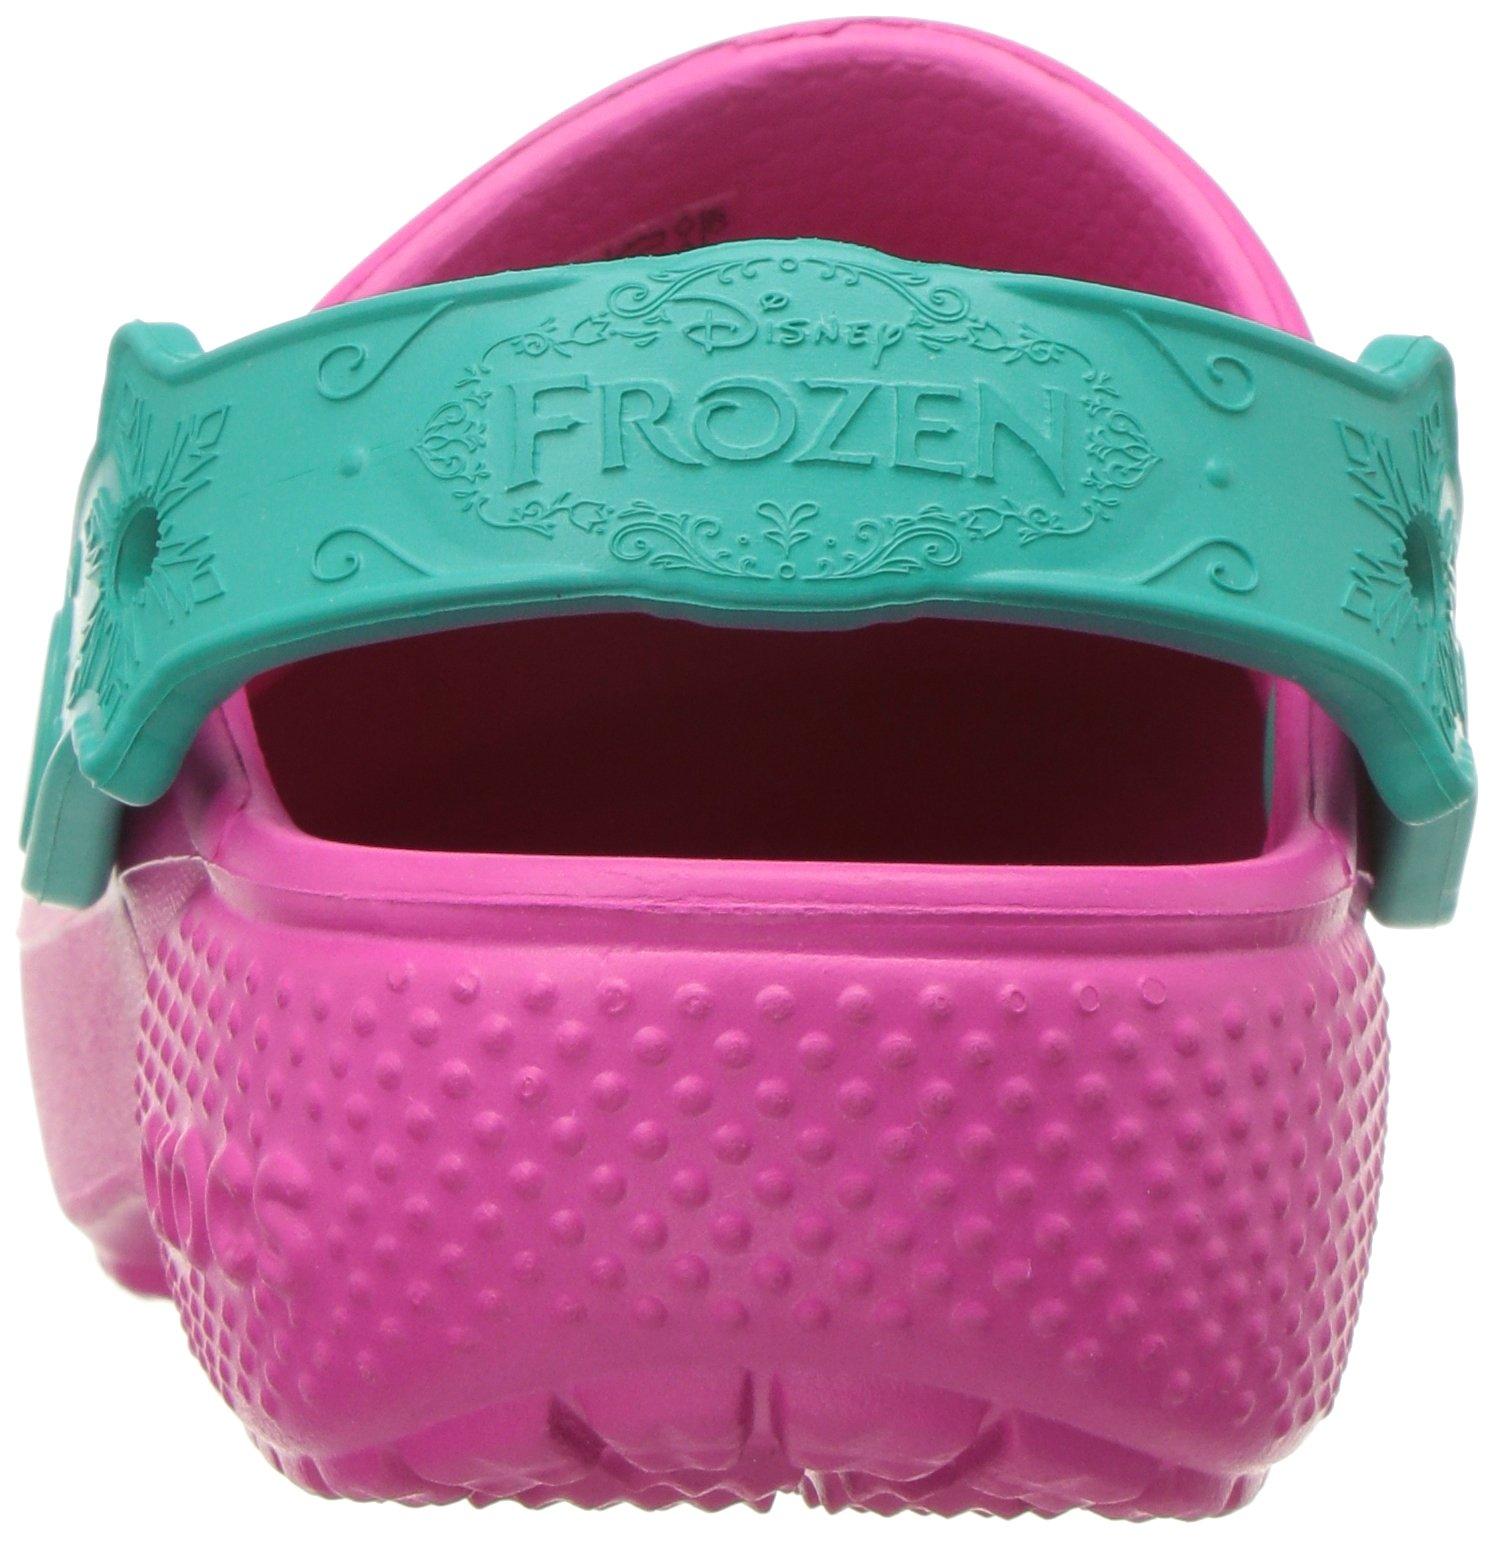 Crocs Girls' Fun Lab Frozen Clog K, Candy Pink, 10 M US Little Kid by Crocs (Image #2)